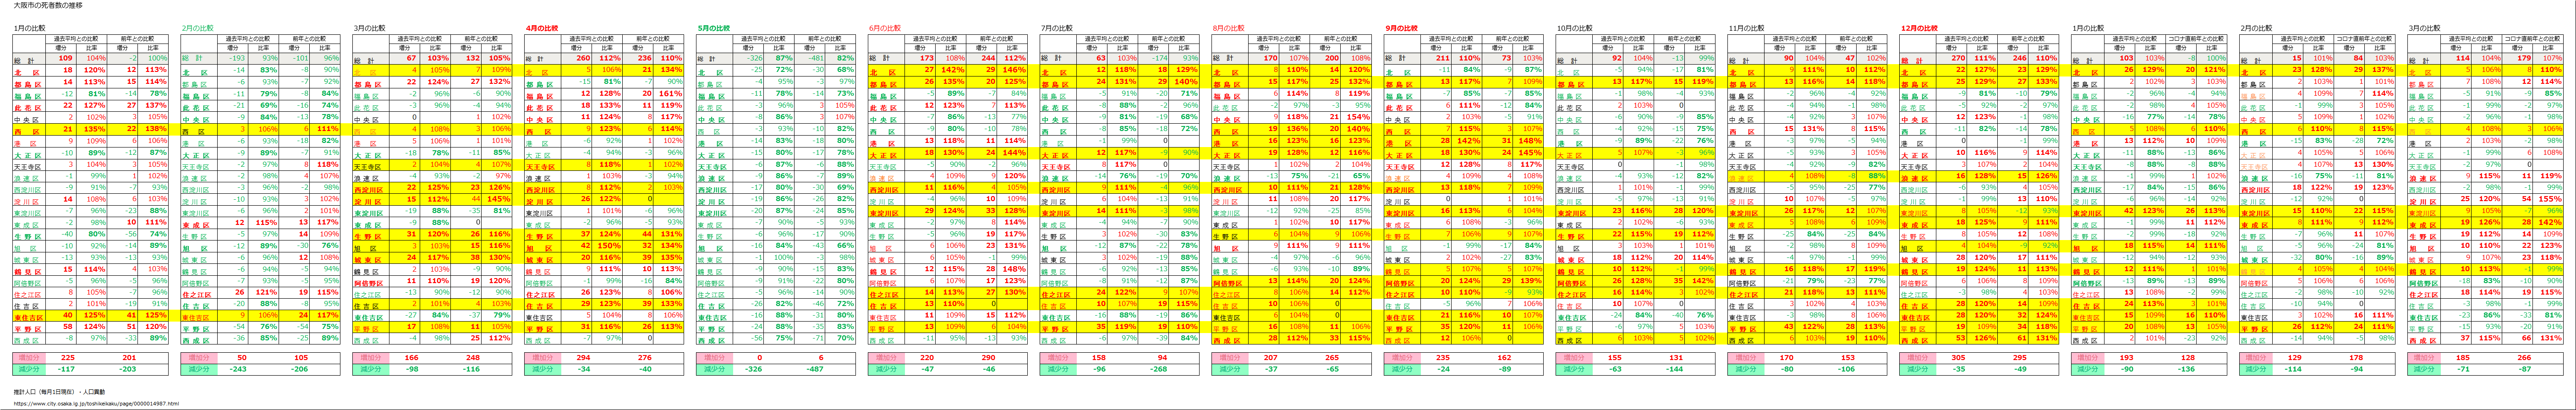 %E5%A4%A7%E9%98%AA%E5%B8%82%E6%AD%BB%E8%80%85%E6%AF%94%E8%BC%83.png